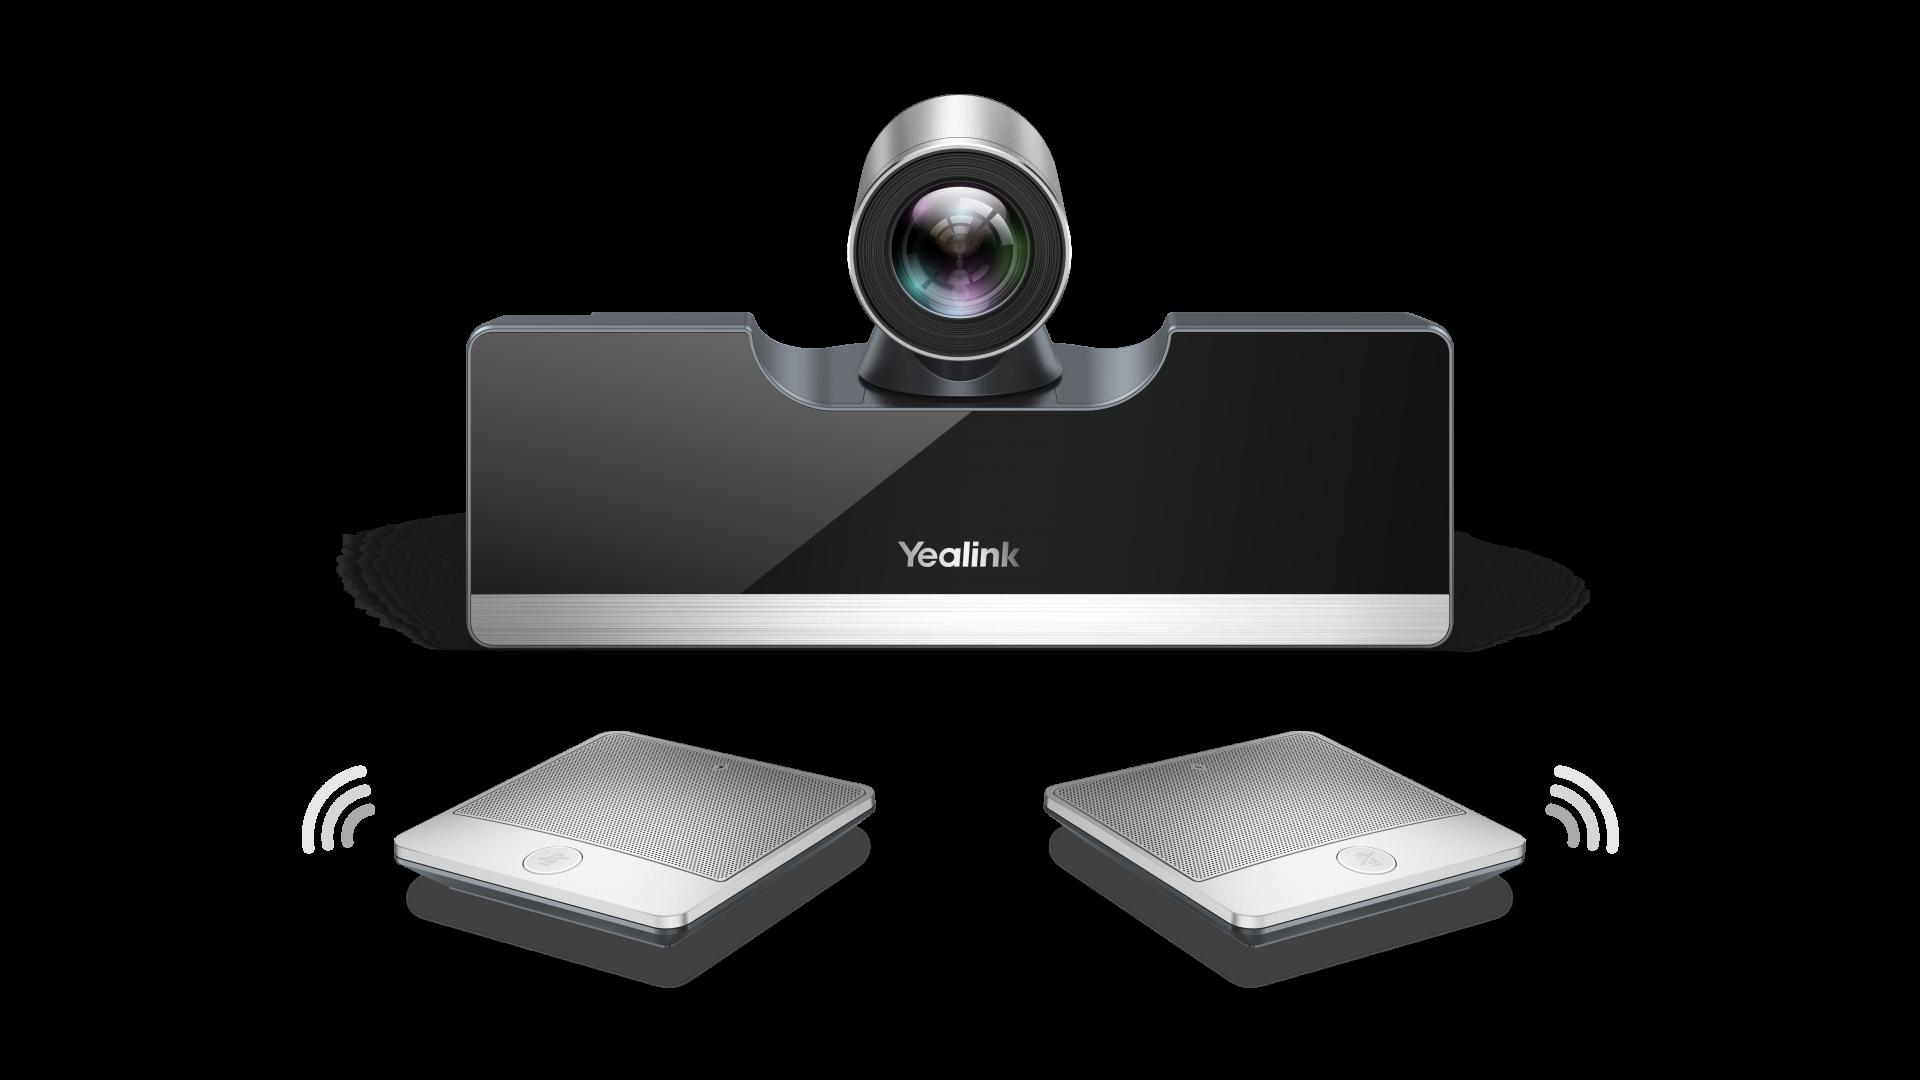 Yealink VC500 Video Konferenzsystem wireless